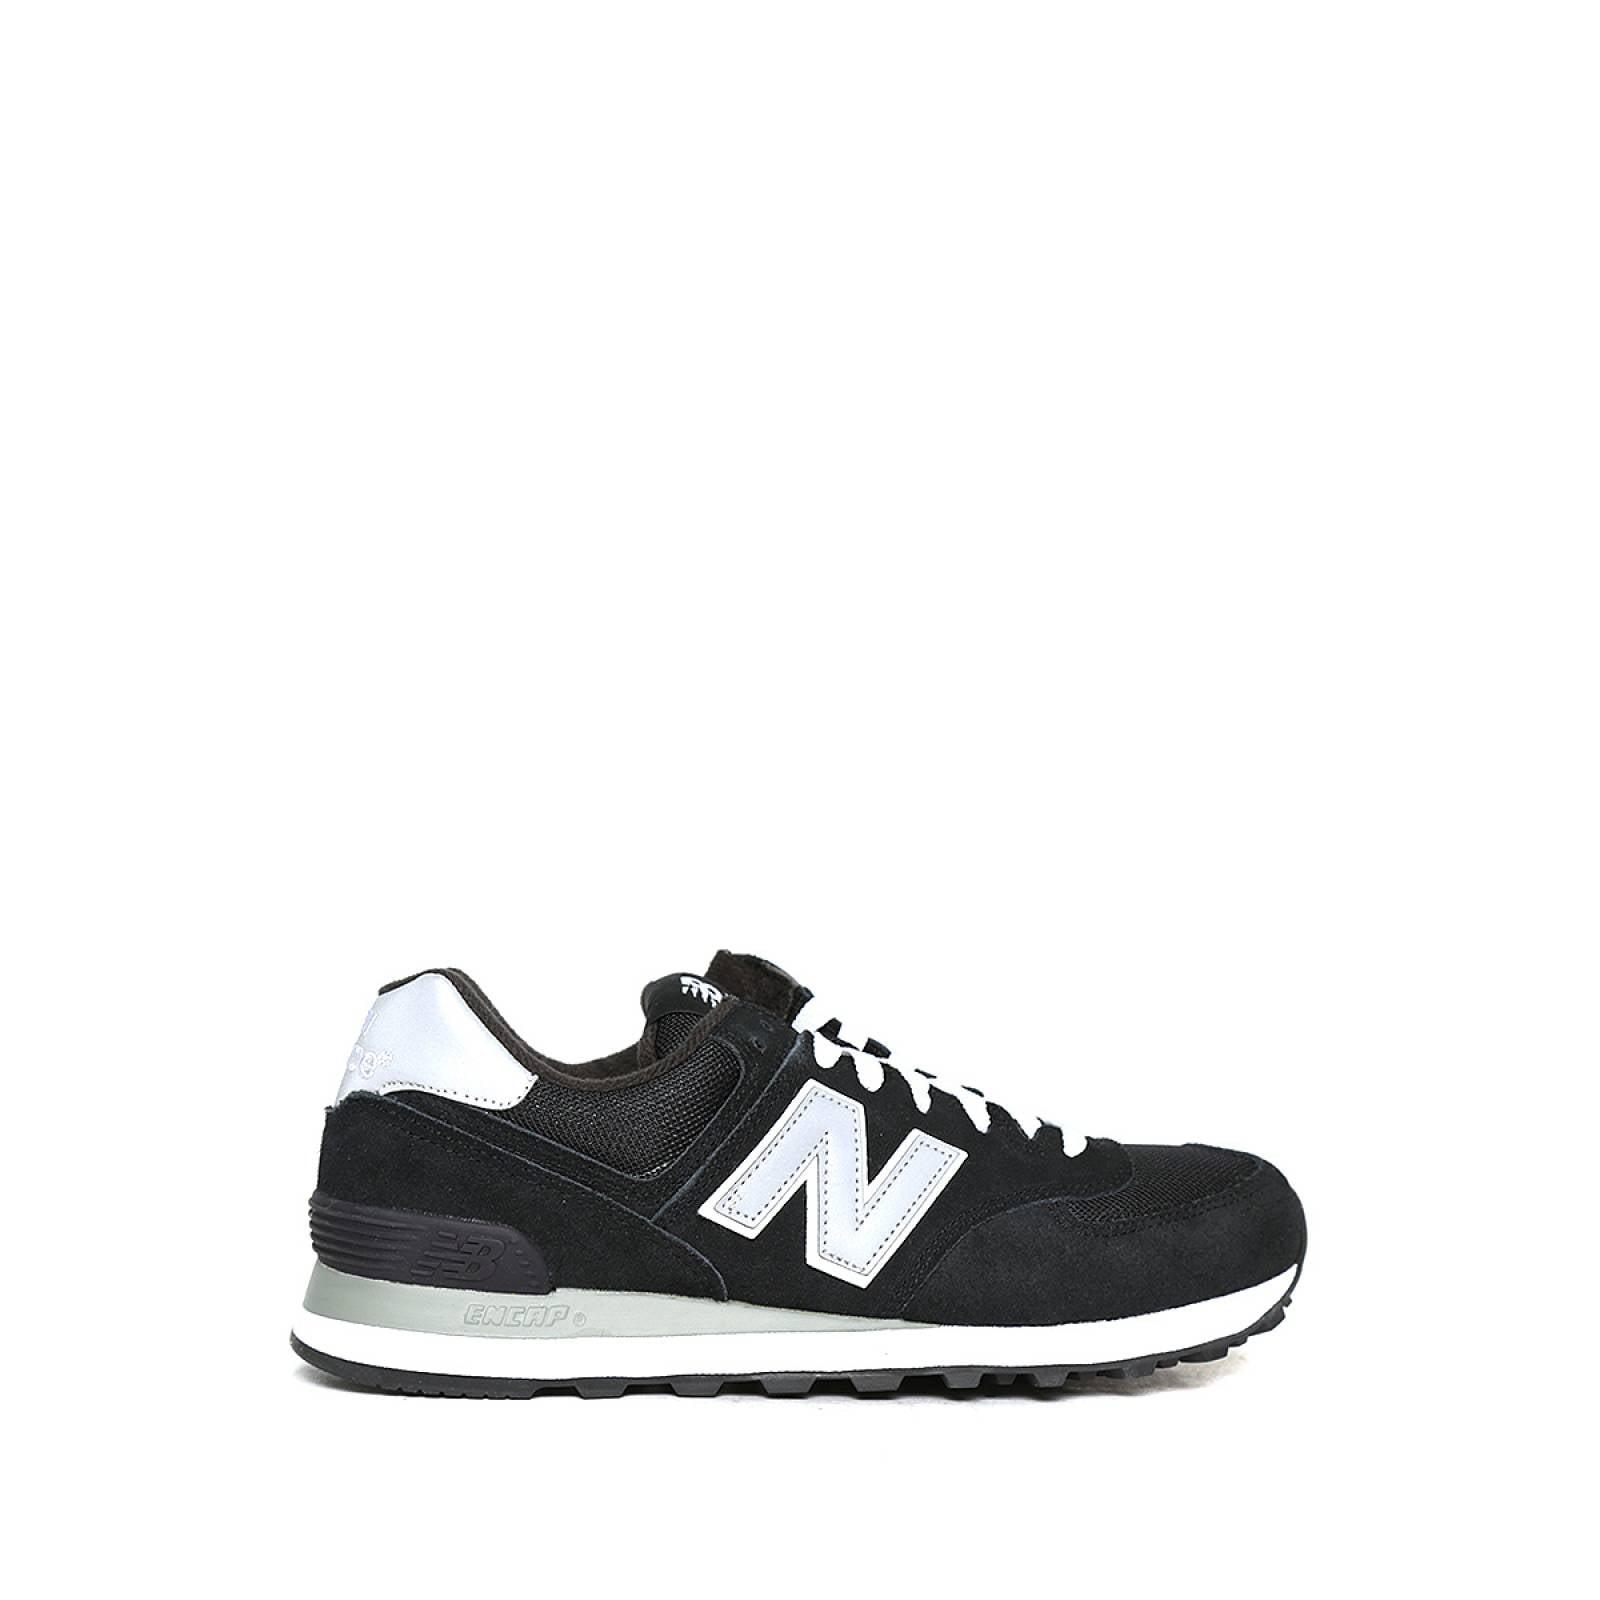 Tenis Negro by New Balance